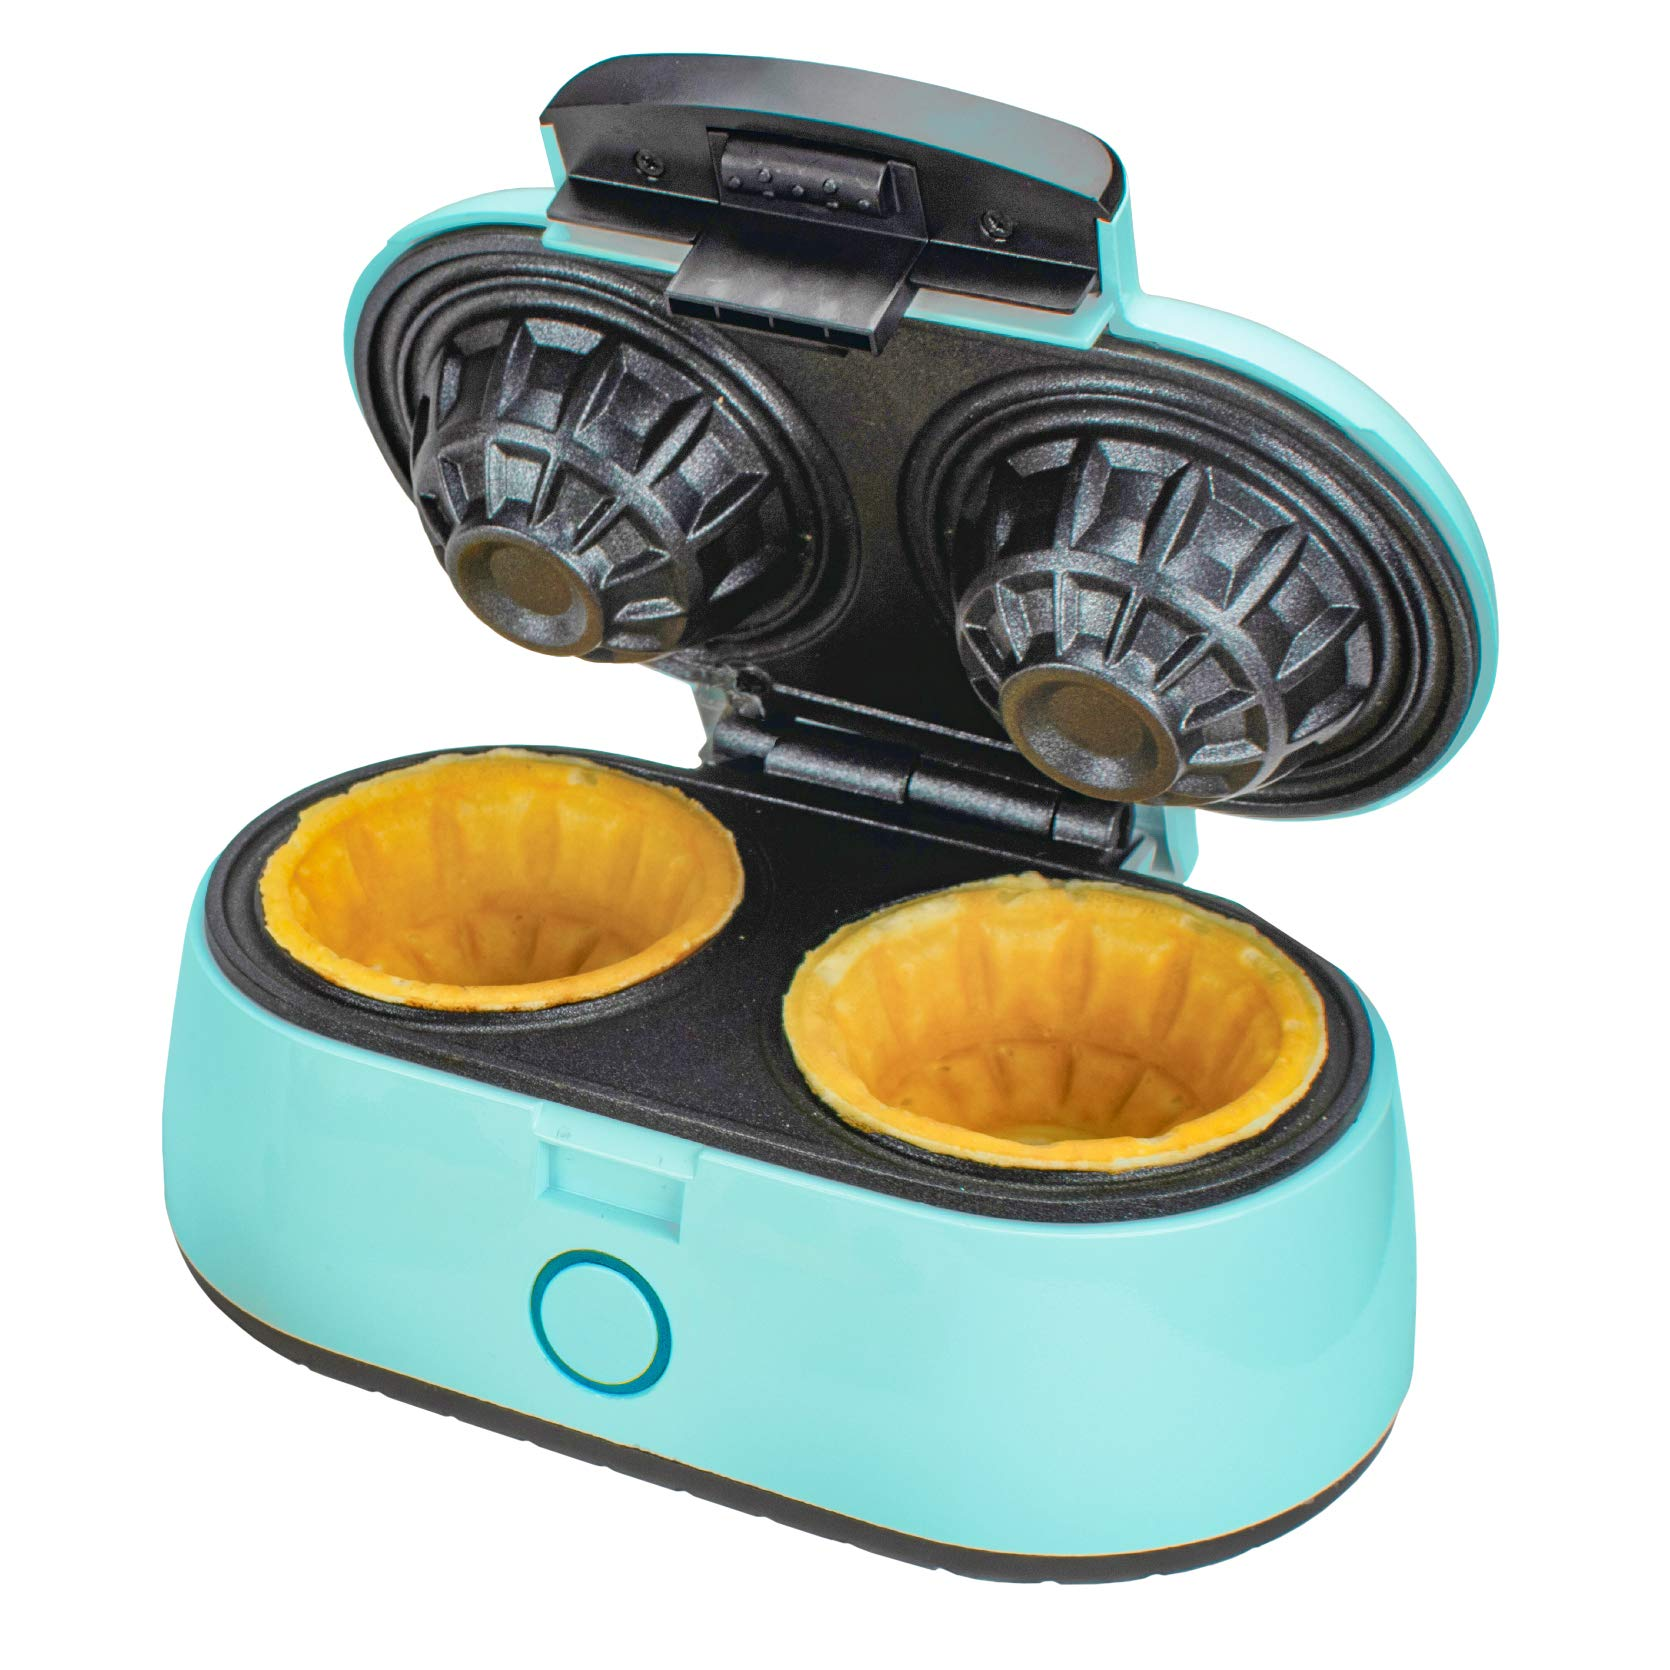 Brentwood Appliances TS-1402BL Double Waffle Bowl Maker, Standard, Blue